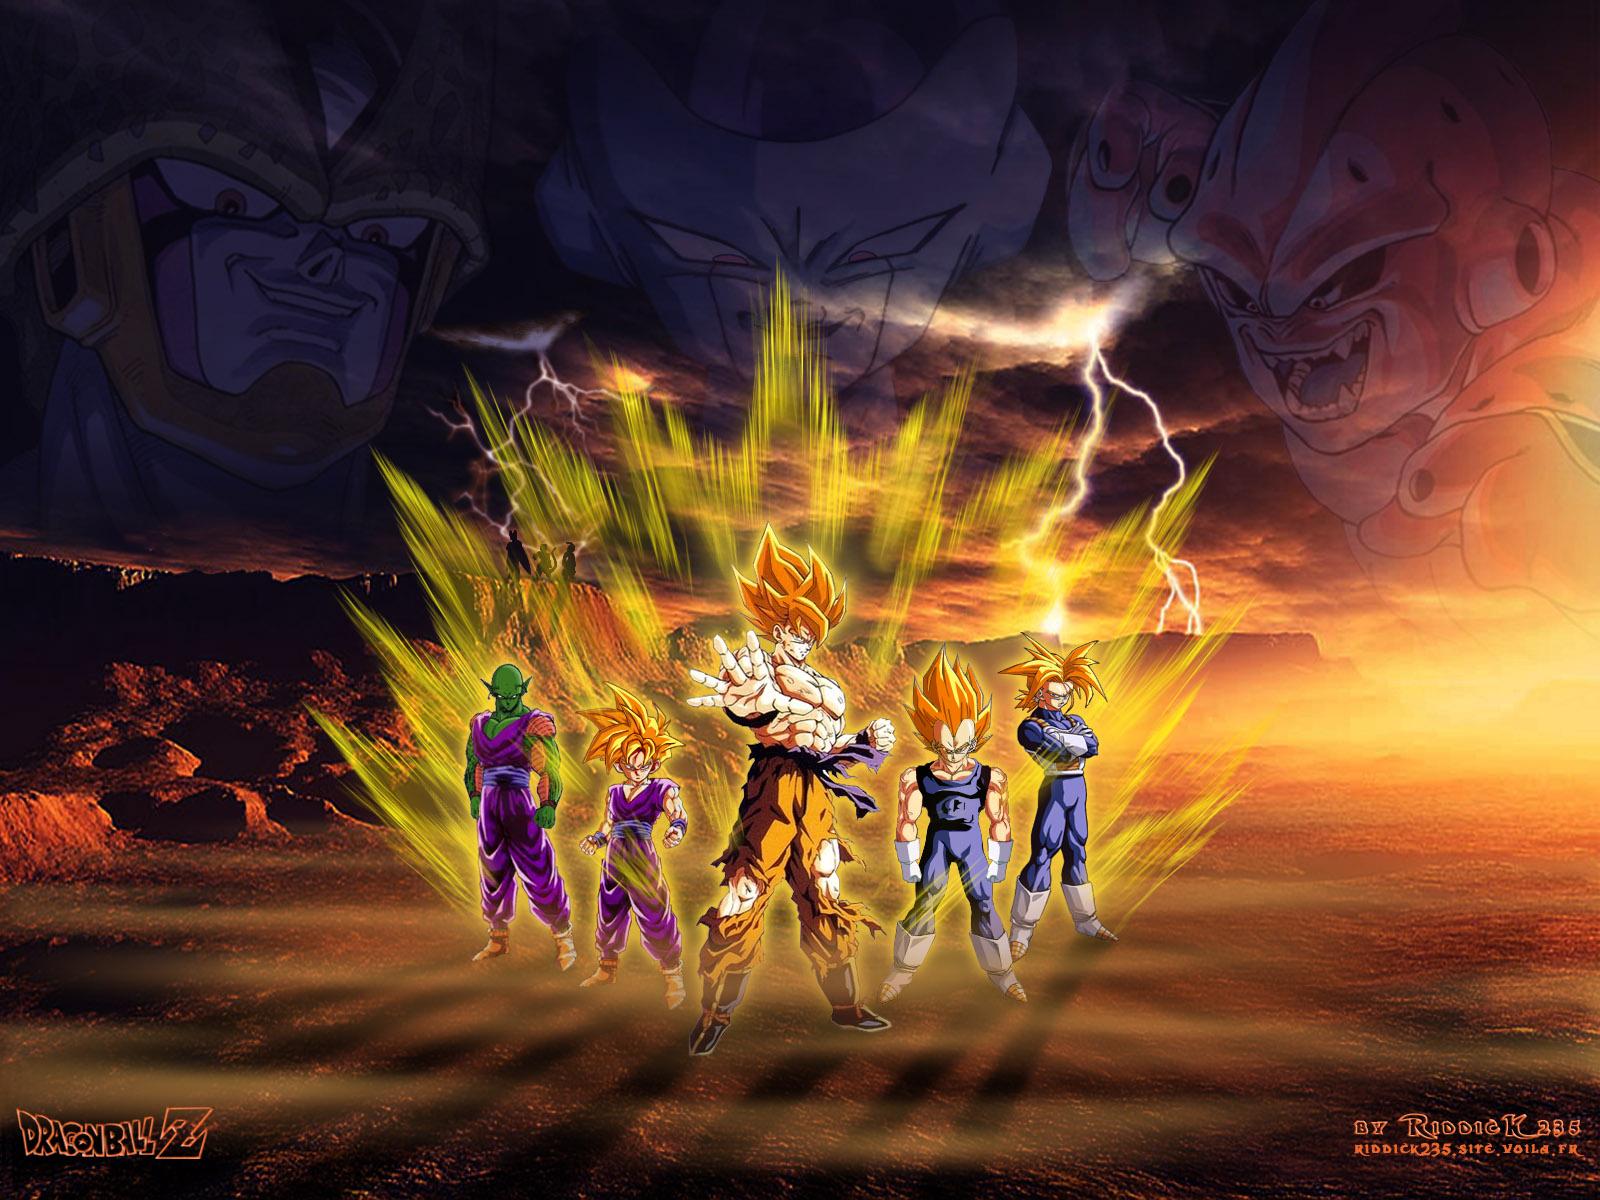 Wallpapers Manga Dragon Ball Z Heros'n'Monsters v2.0